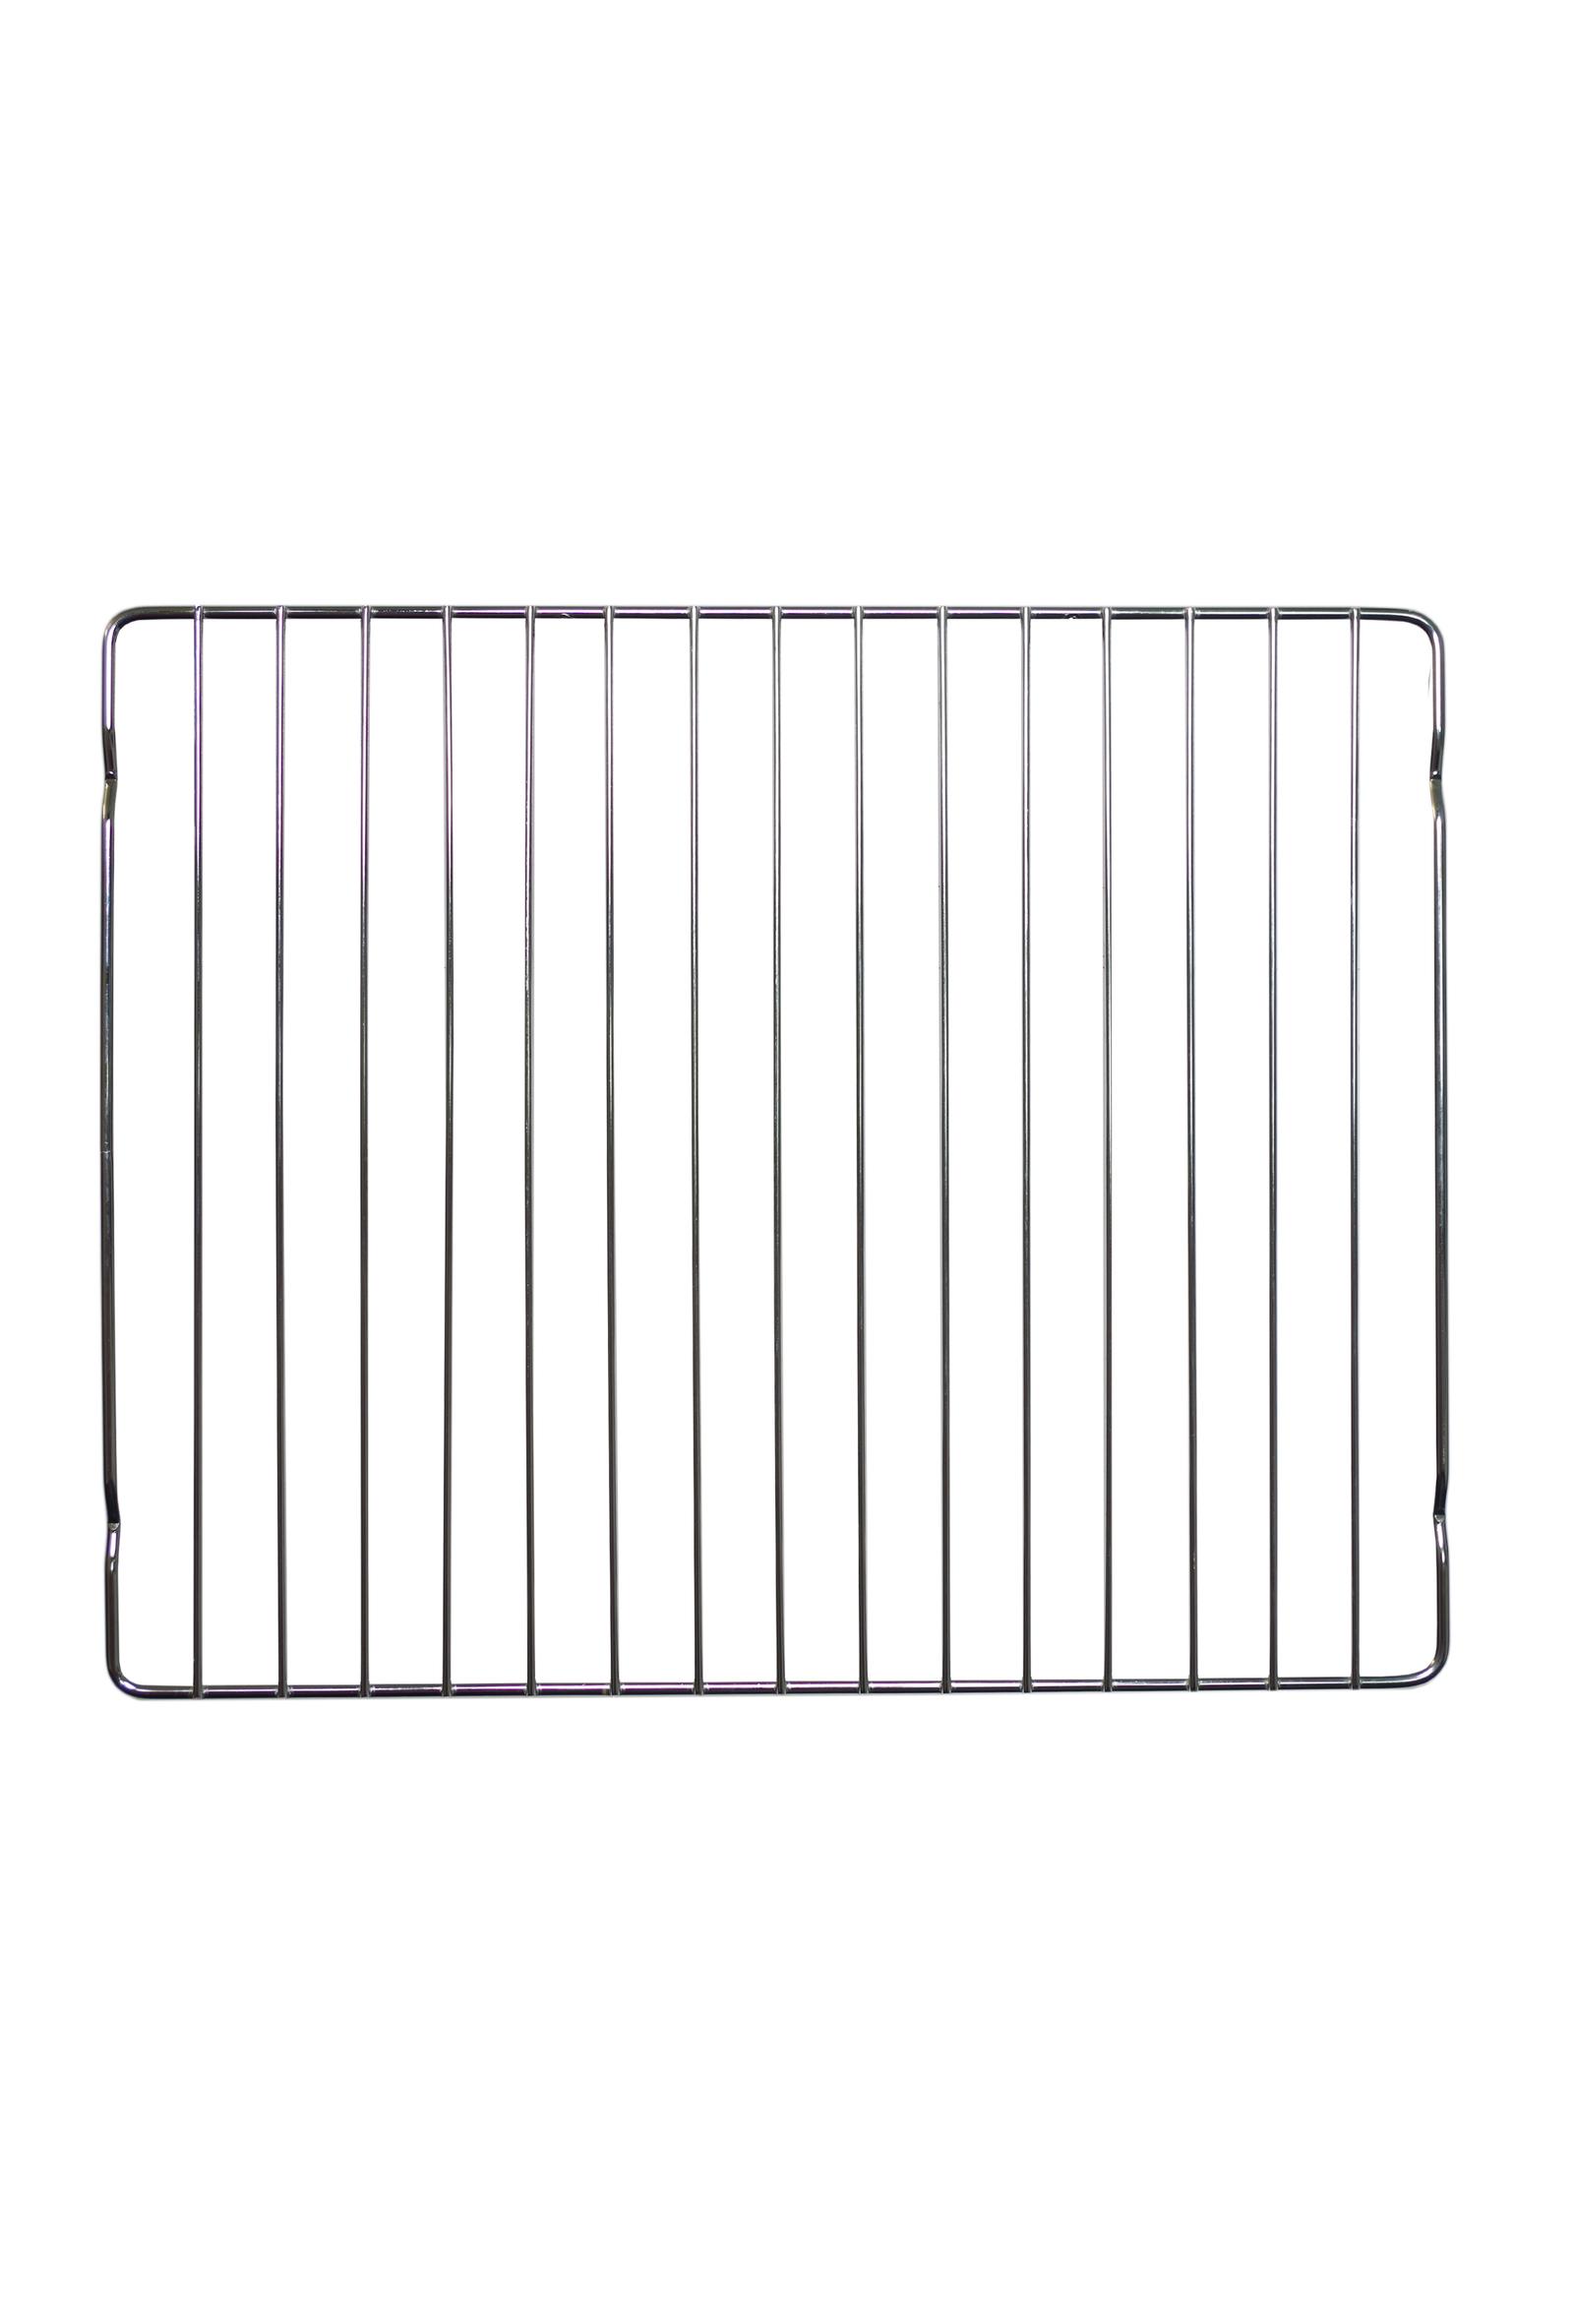 Oven Wire Shelf